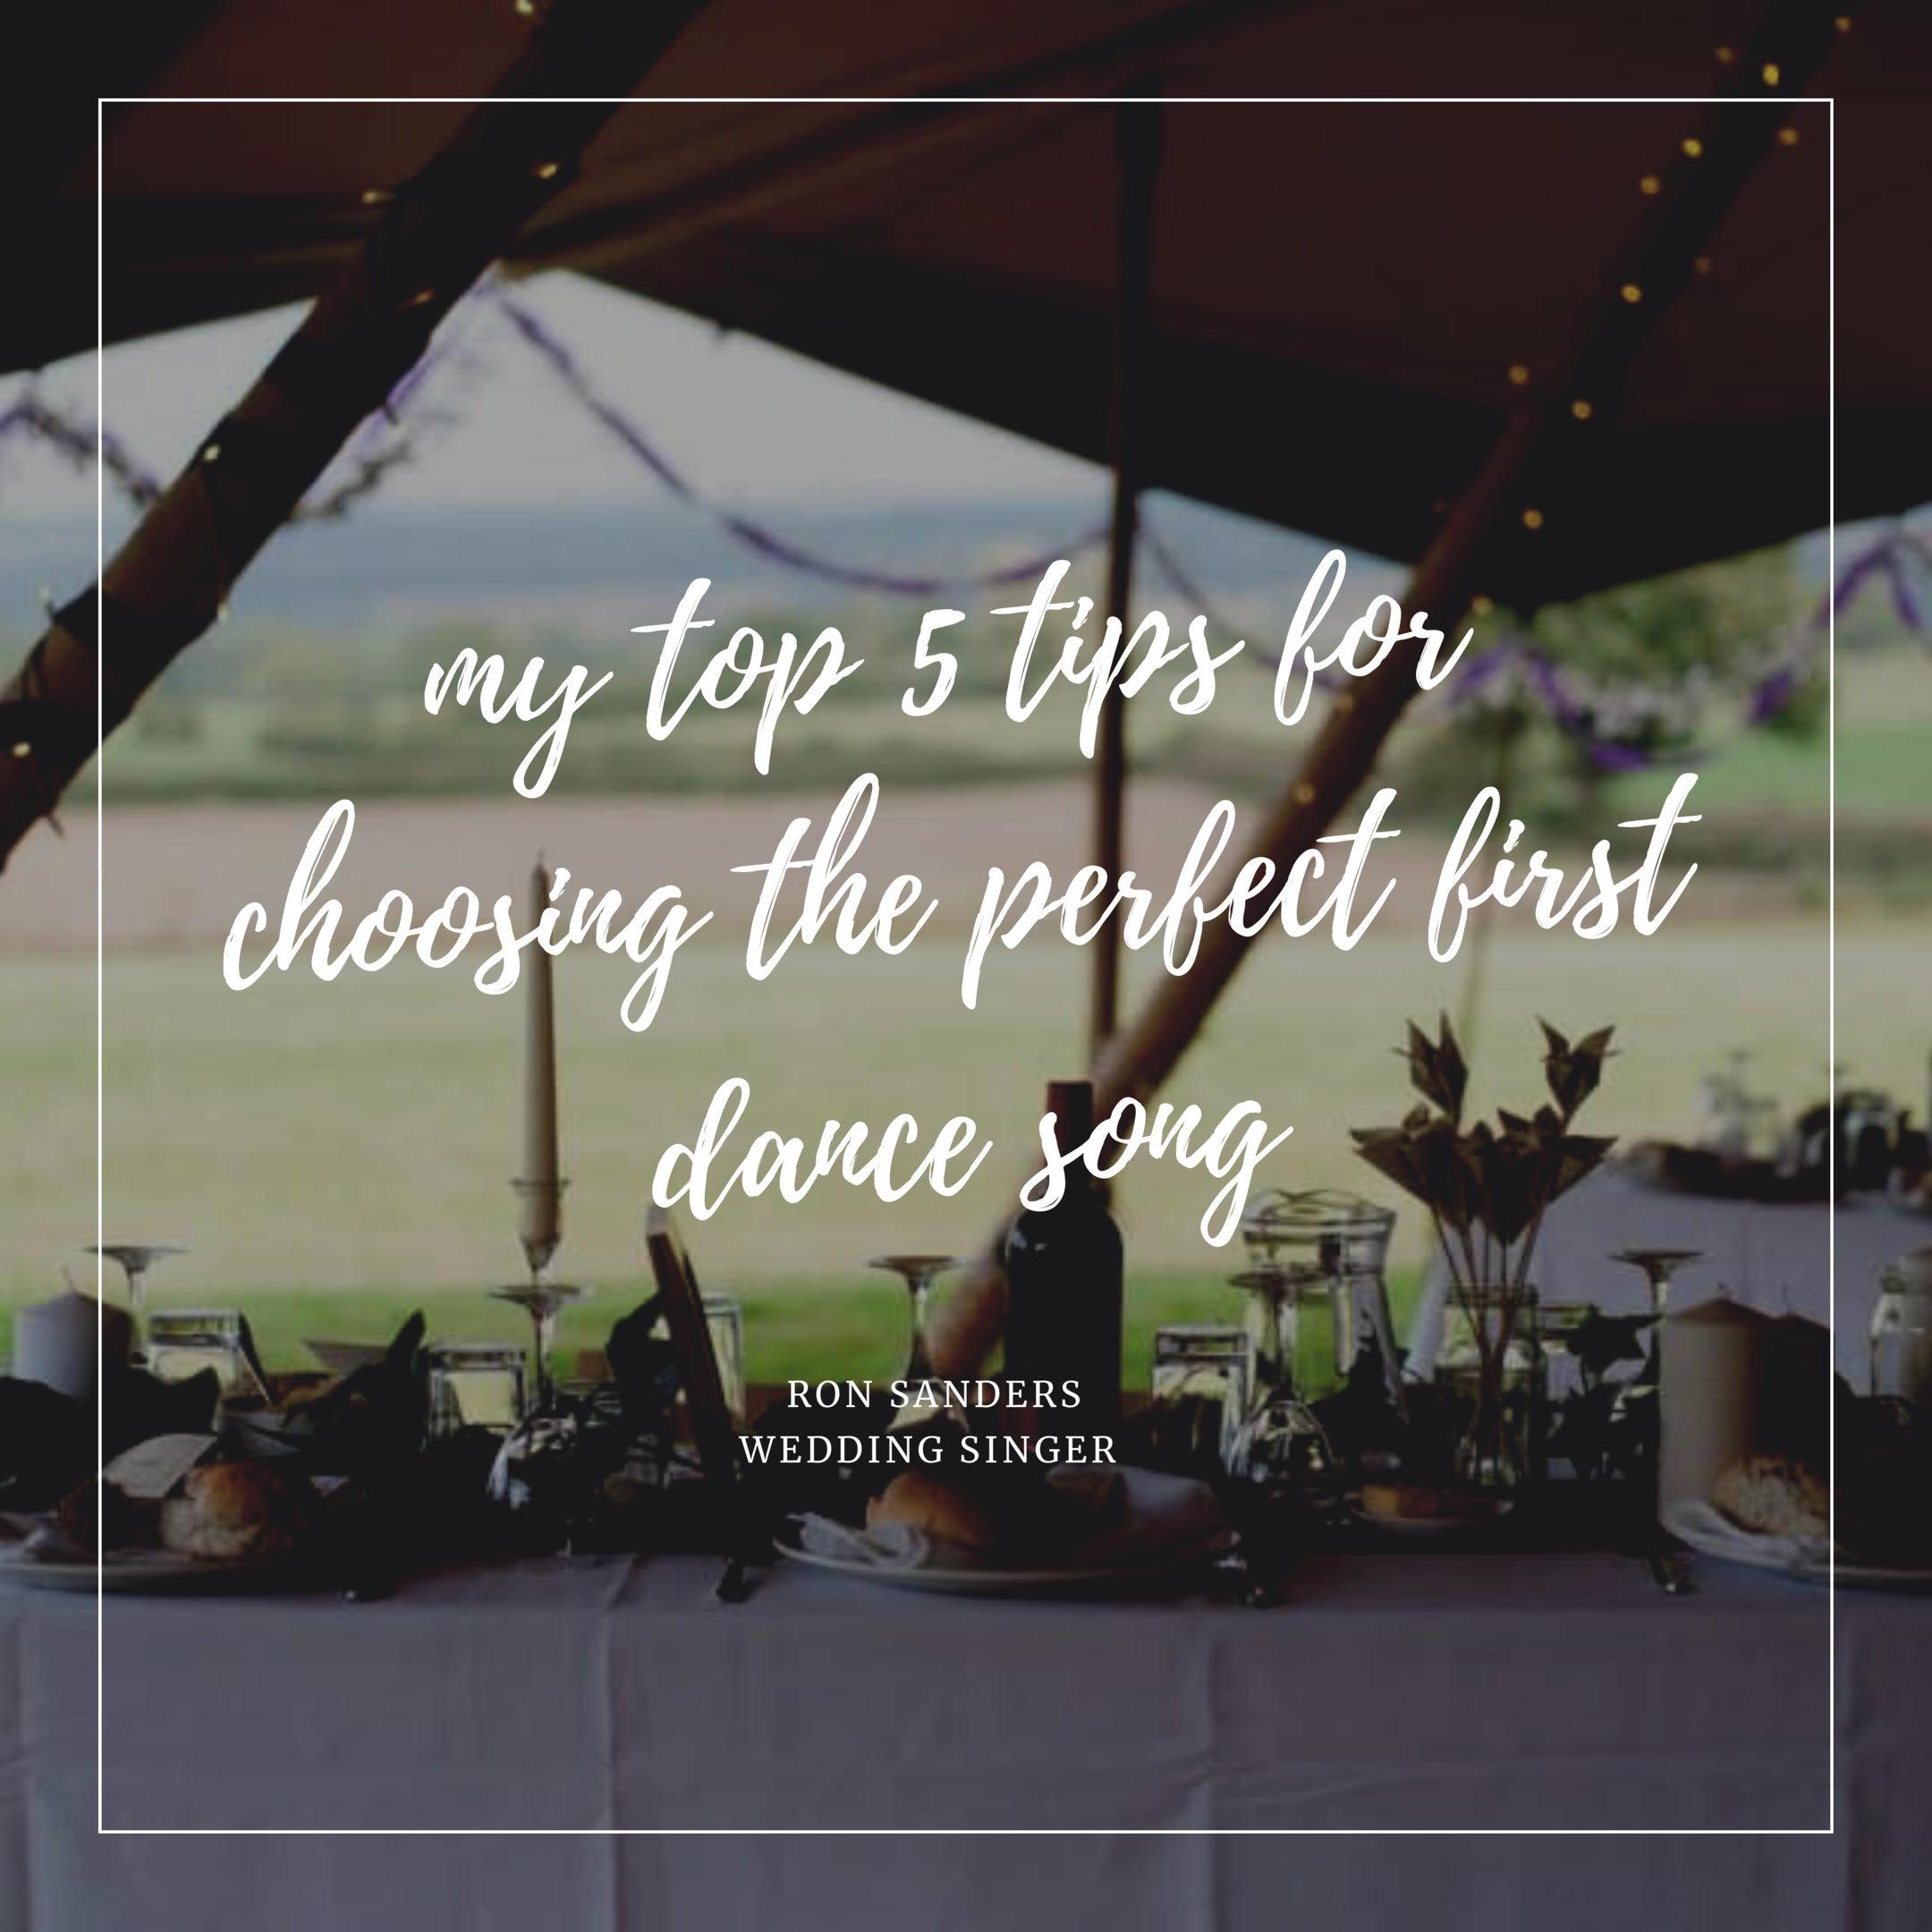 Ron Sanders Wedding Singer Top tips for choosing your firt dance song! www.redeventweddingfayres.com.jpg